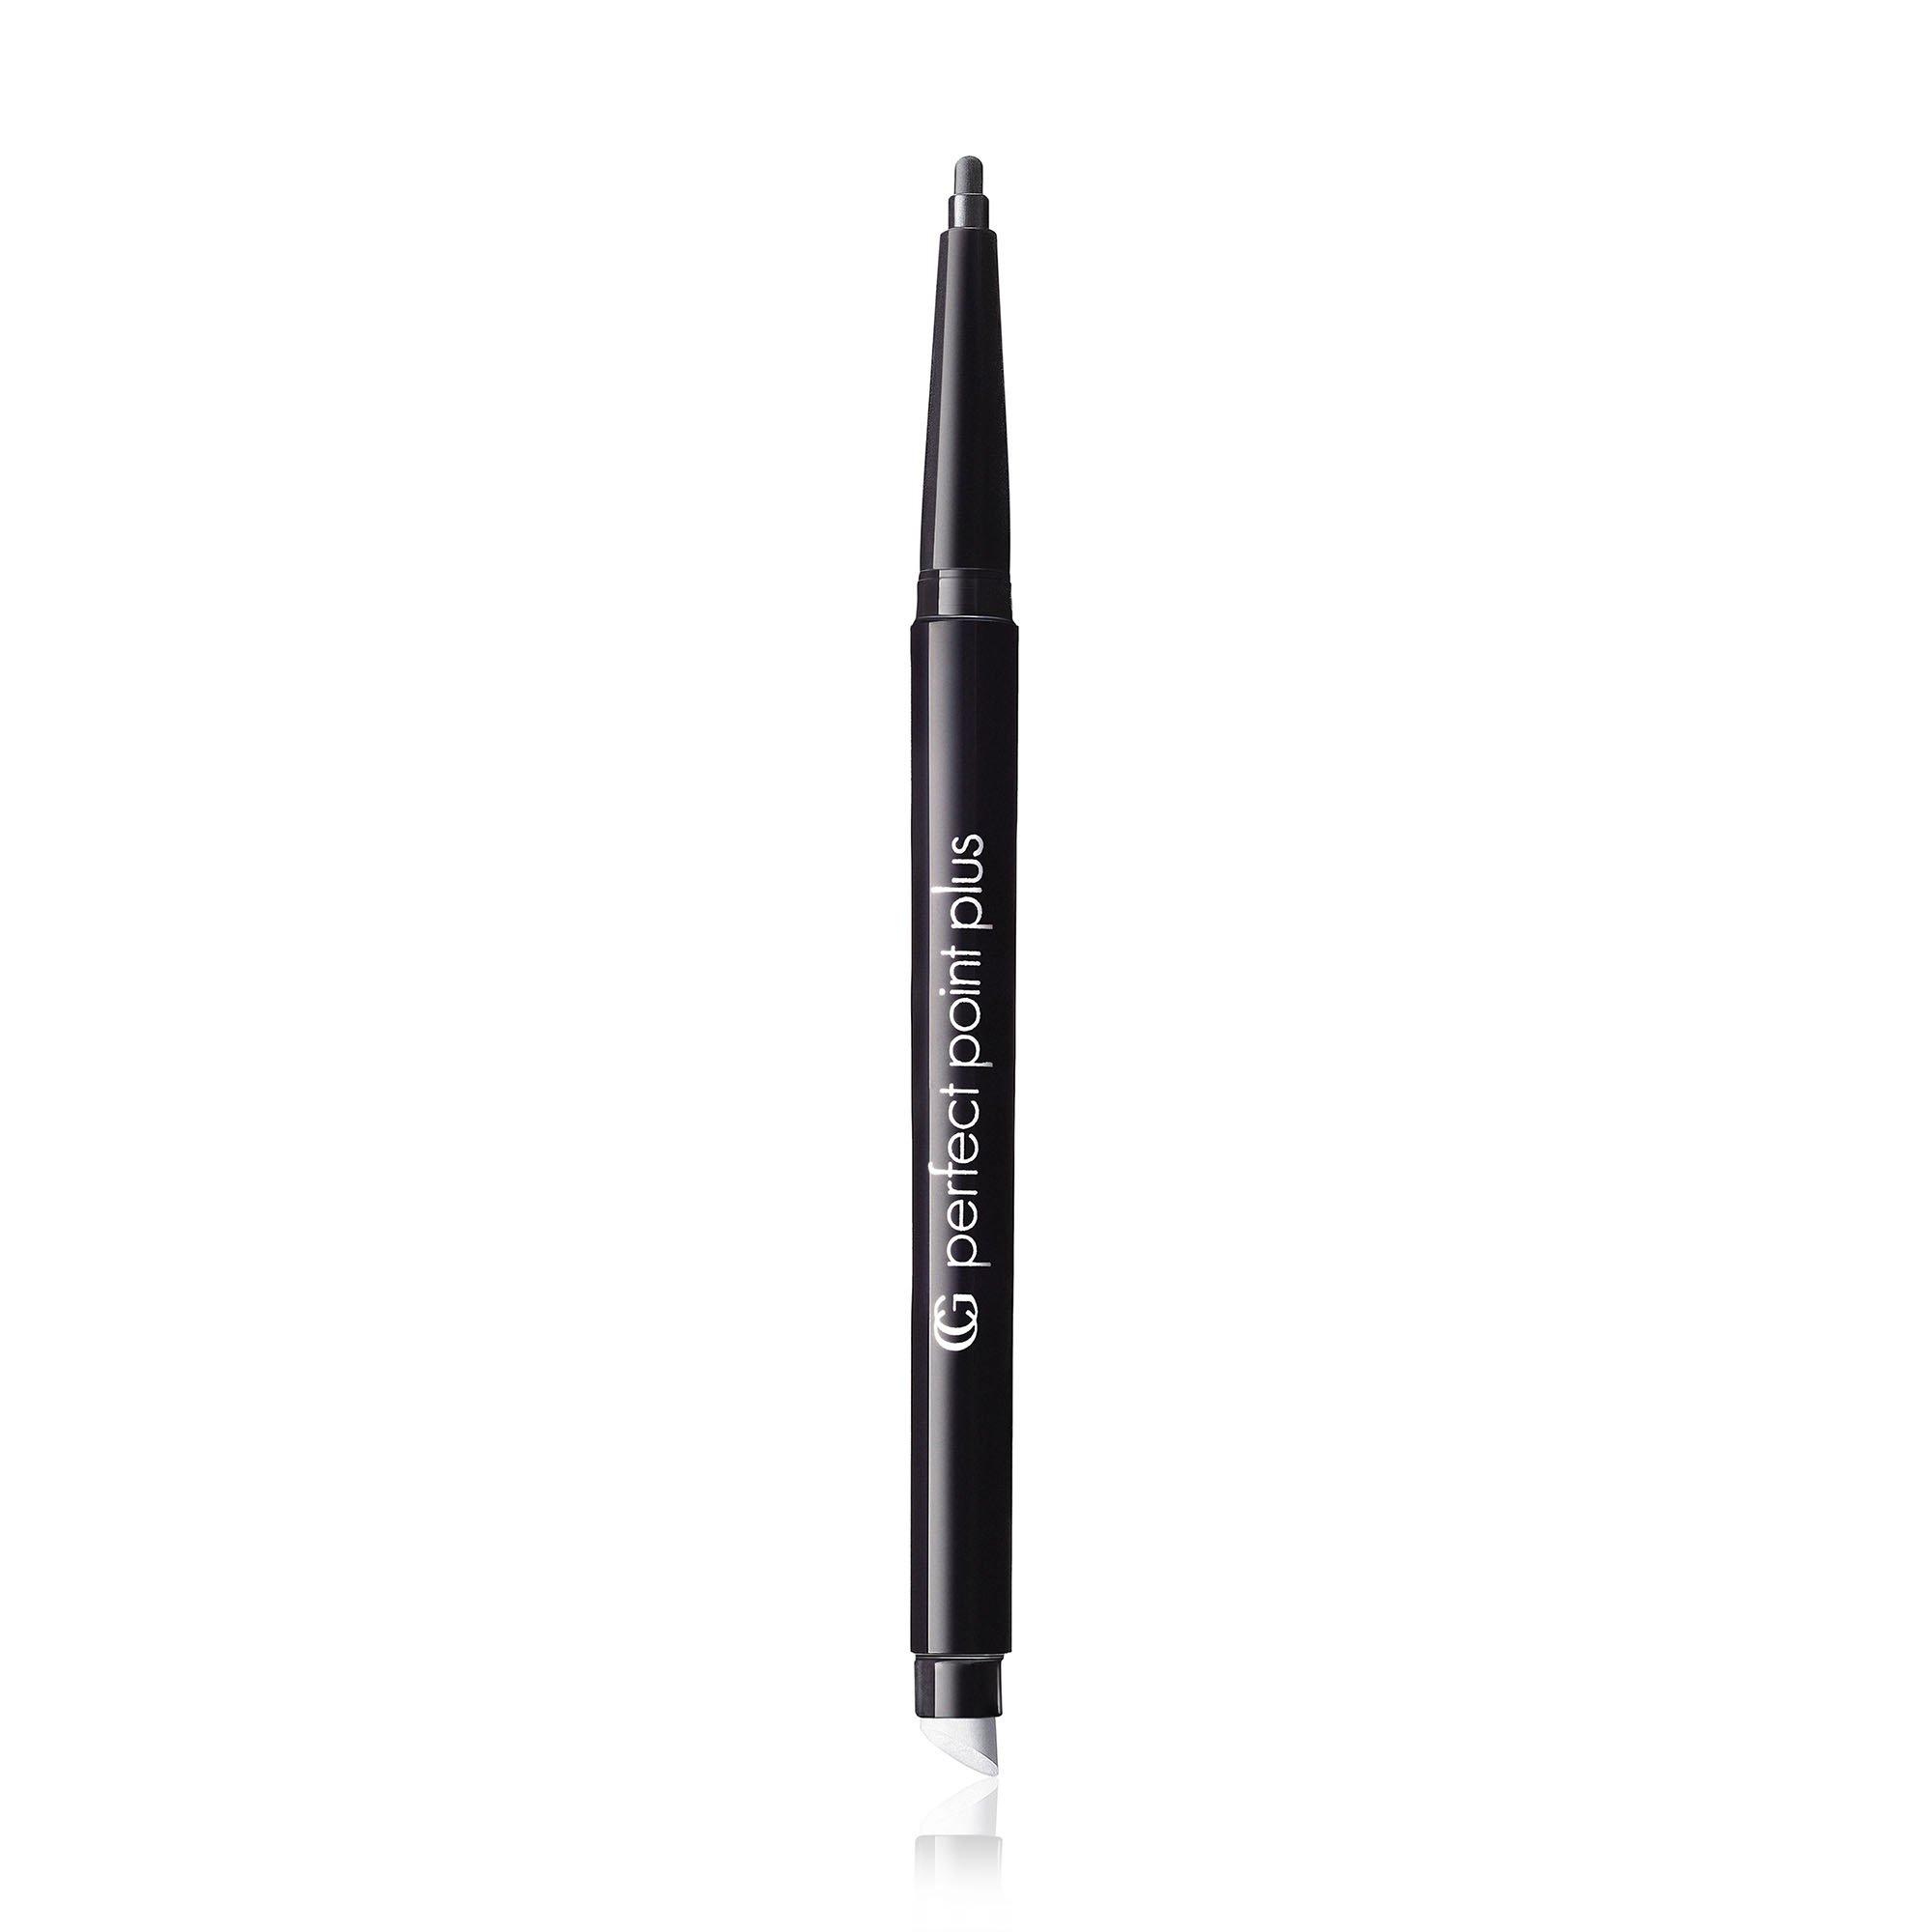 COVERGIRL Perfect Point PLUS Eyeliner, One Pencil, Black Onyx Color, Self Sharpening Eyeliner Pencil, Smudger Tip for Blending